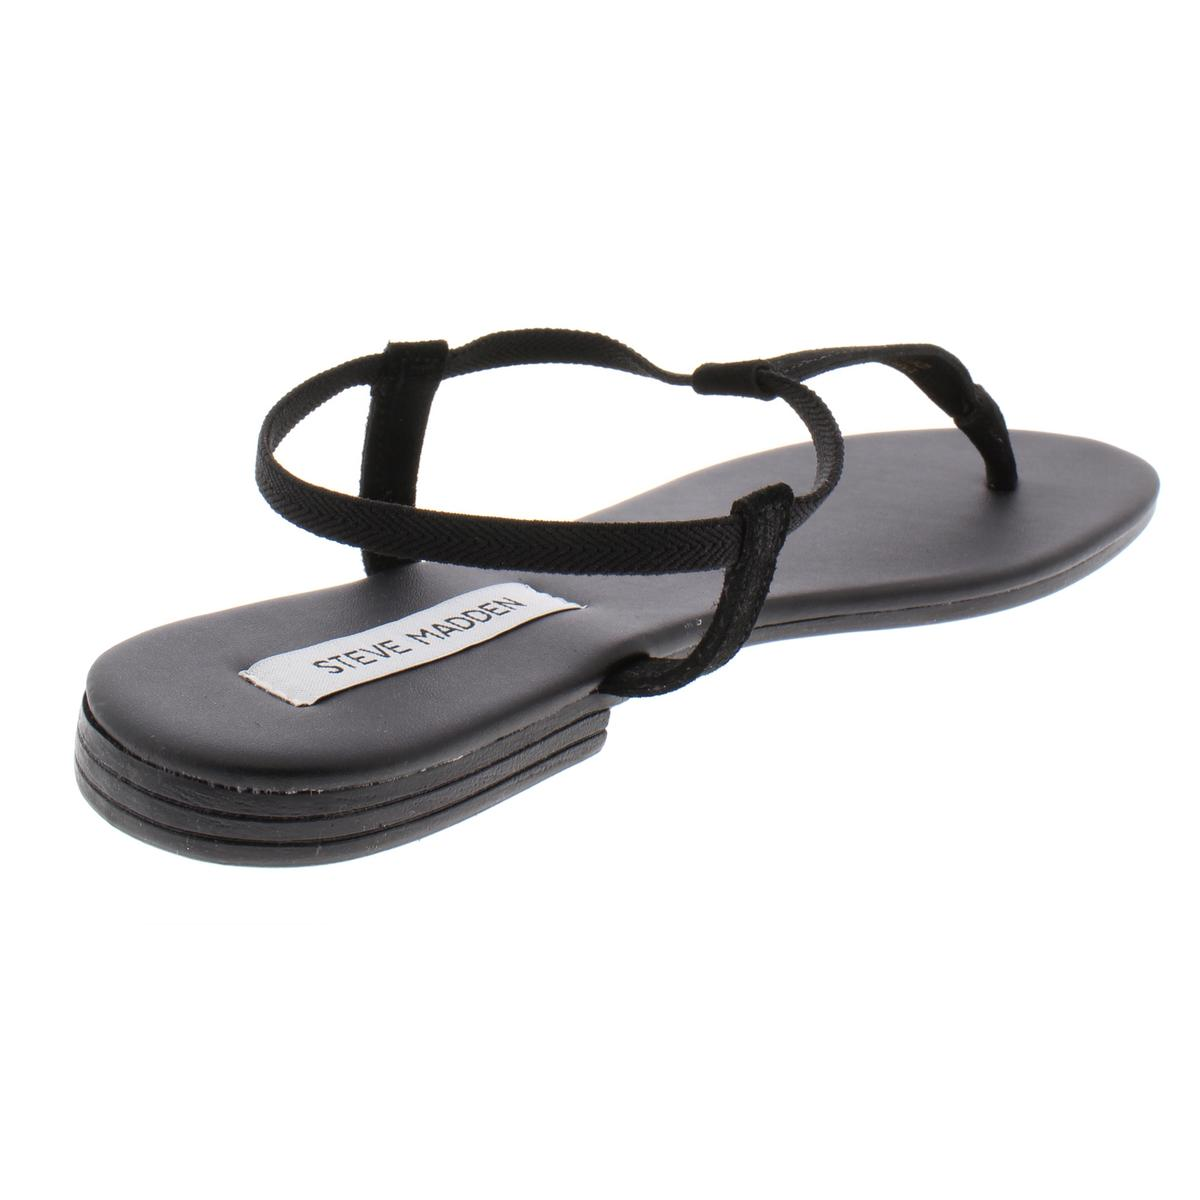 Steve-Madden-Women-039-s-Synergy-Leather-Thong-T-Strap-Sandals thumbnail 3